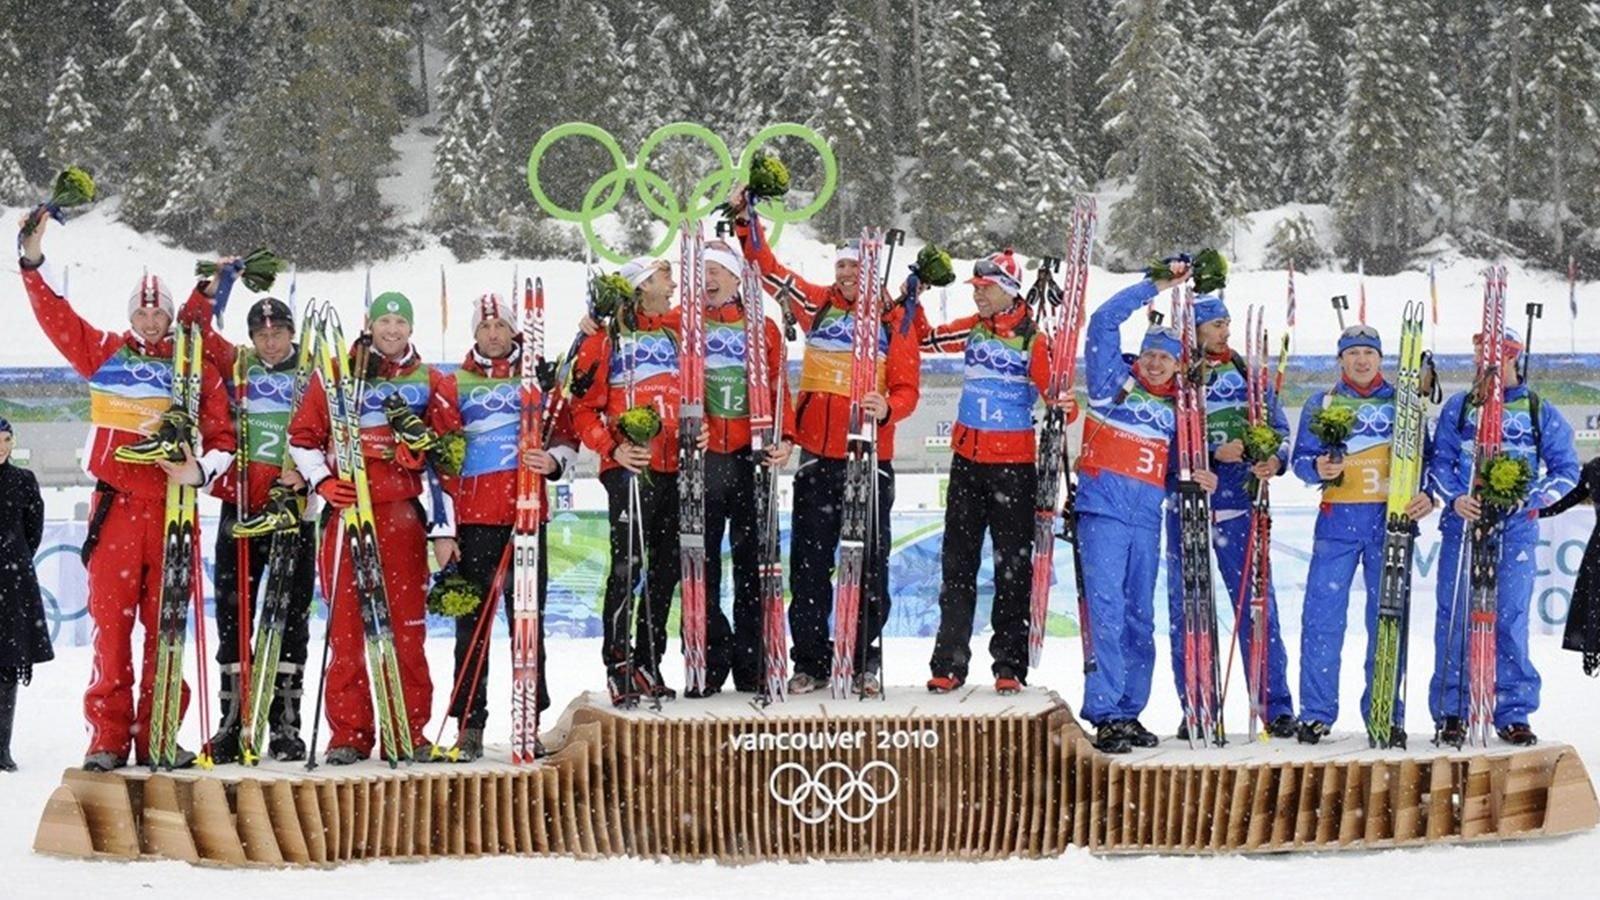 Норвегия установила новый рекорд поколичеству наград зимних Олимпиад